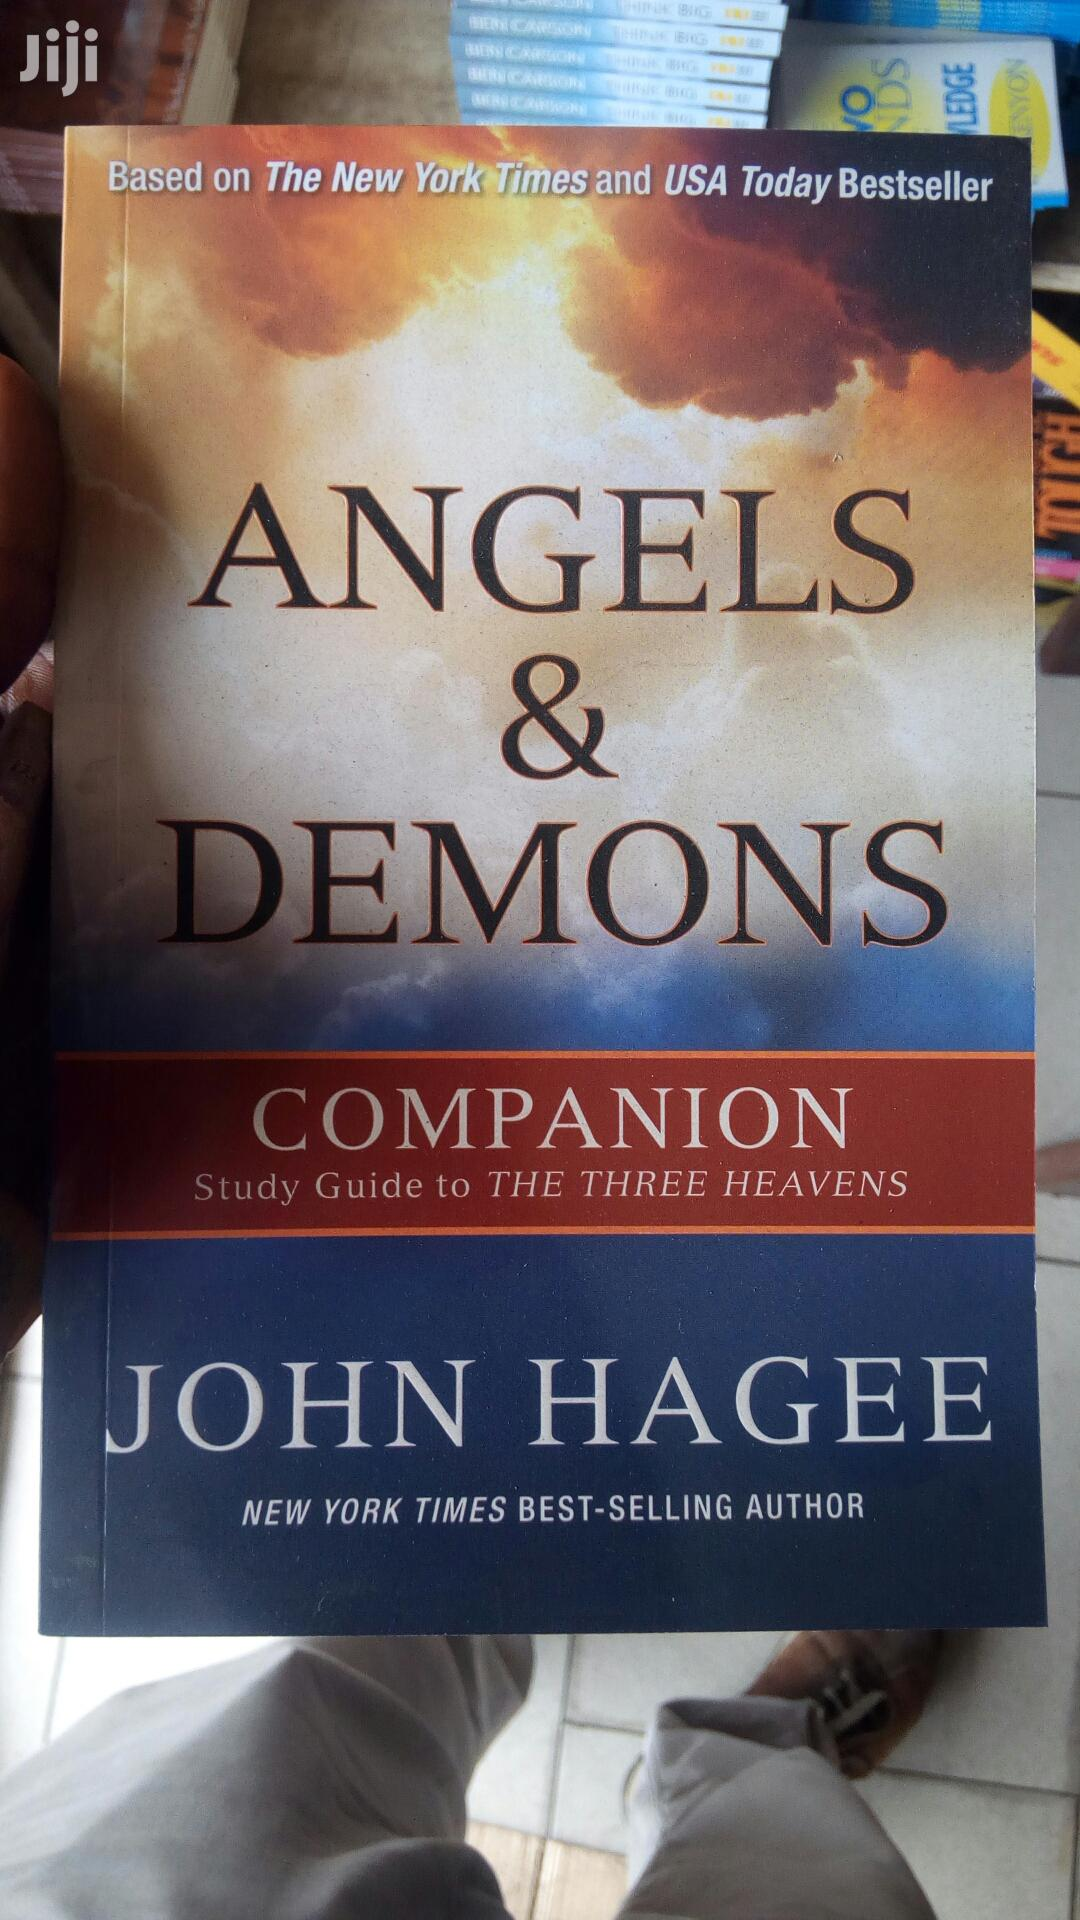 Download John Hagee Books Pdf